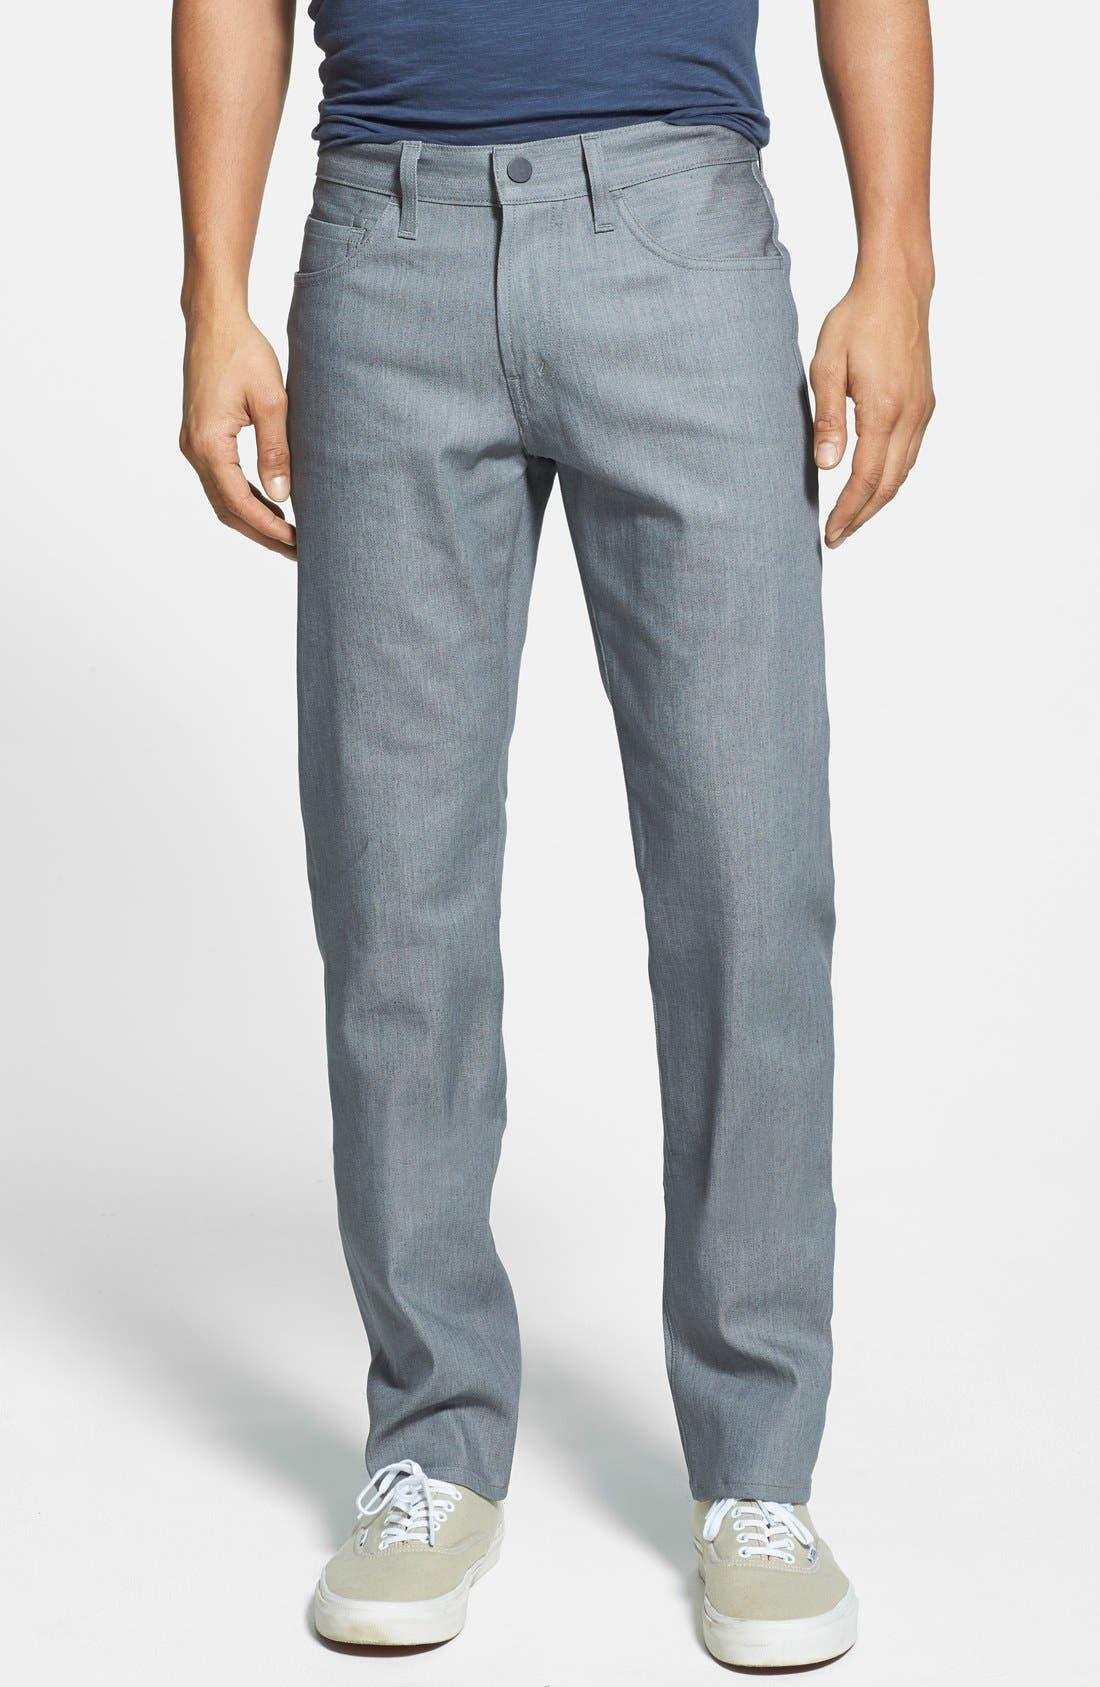 Alternate Image 1 Selected - J Brand 'Kane' Slim Fit Jeans (Stretch Raw Silver)